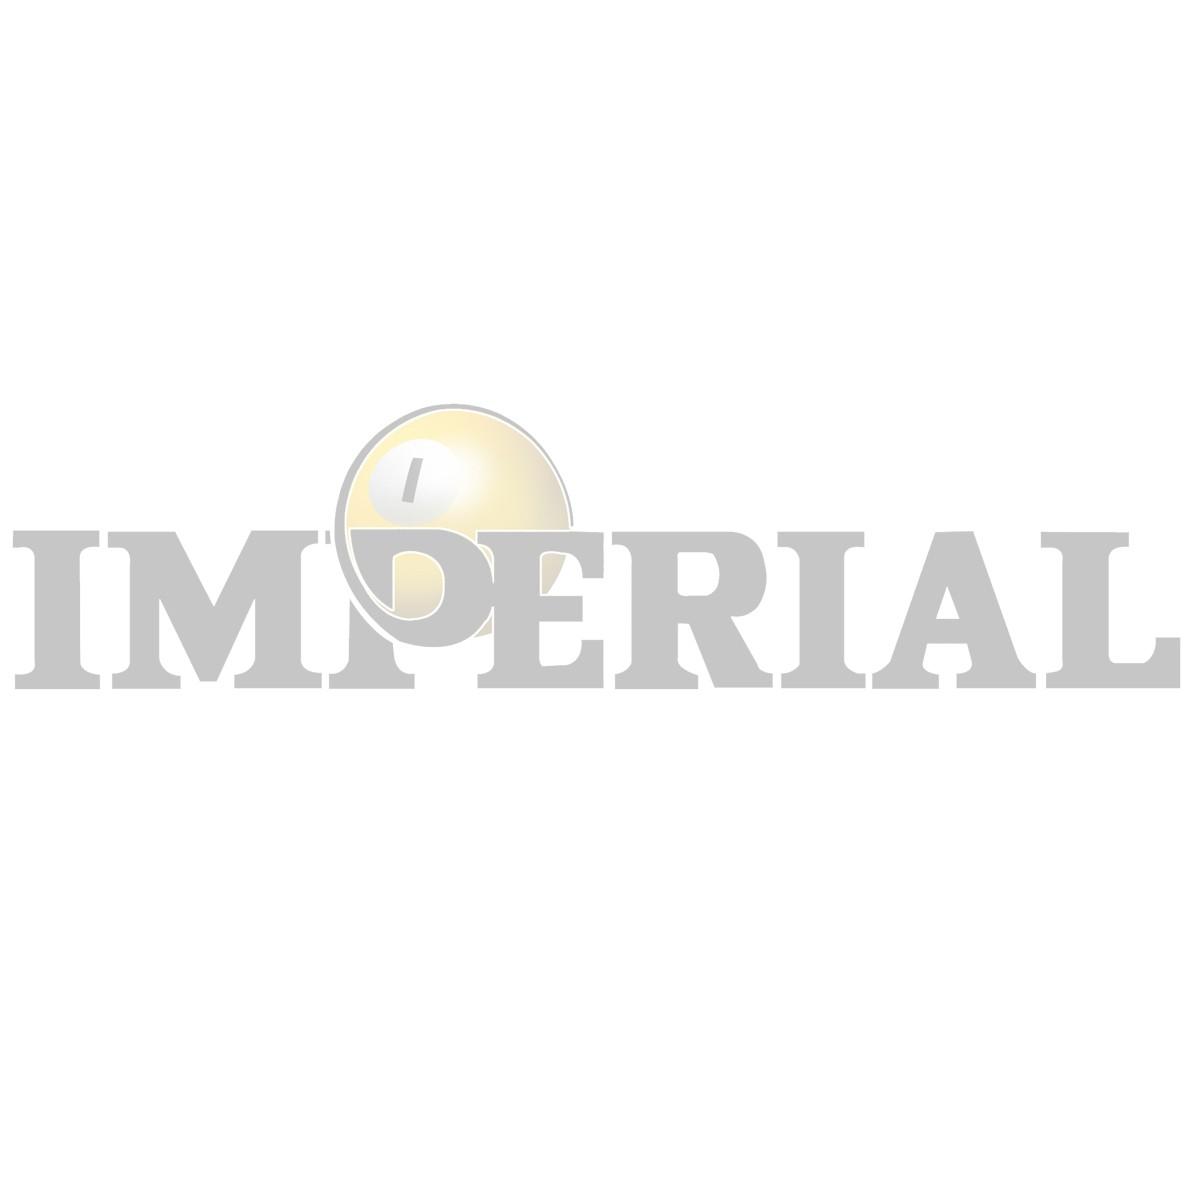 Los Angeles Angels Home vs. Away Billiard Ball Set